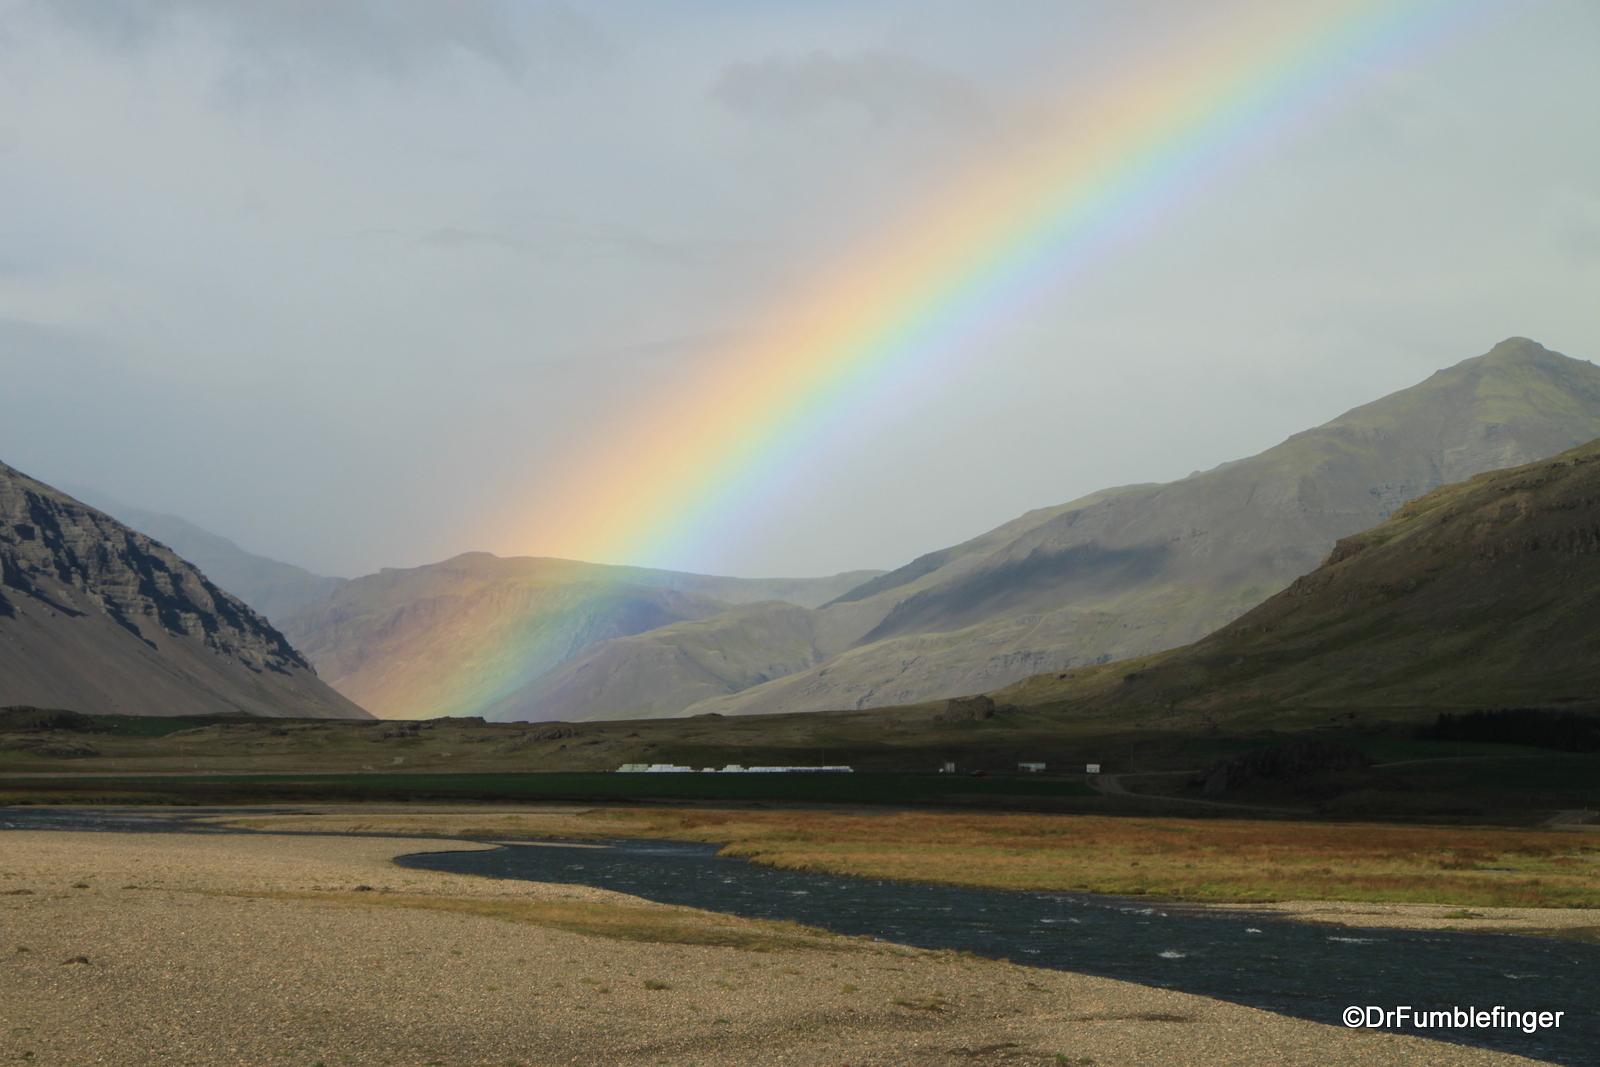 Rainbow over North Iceland